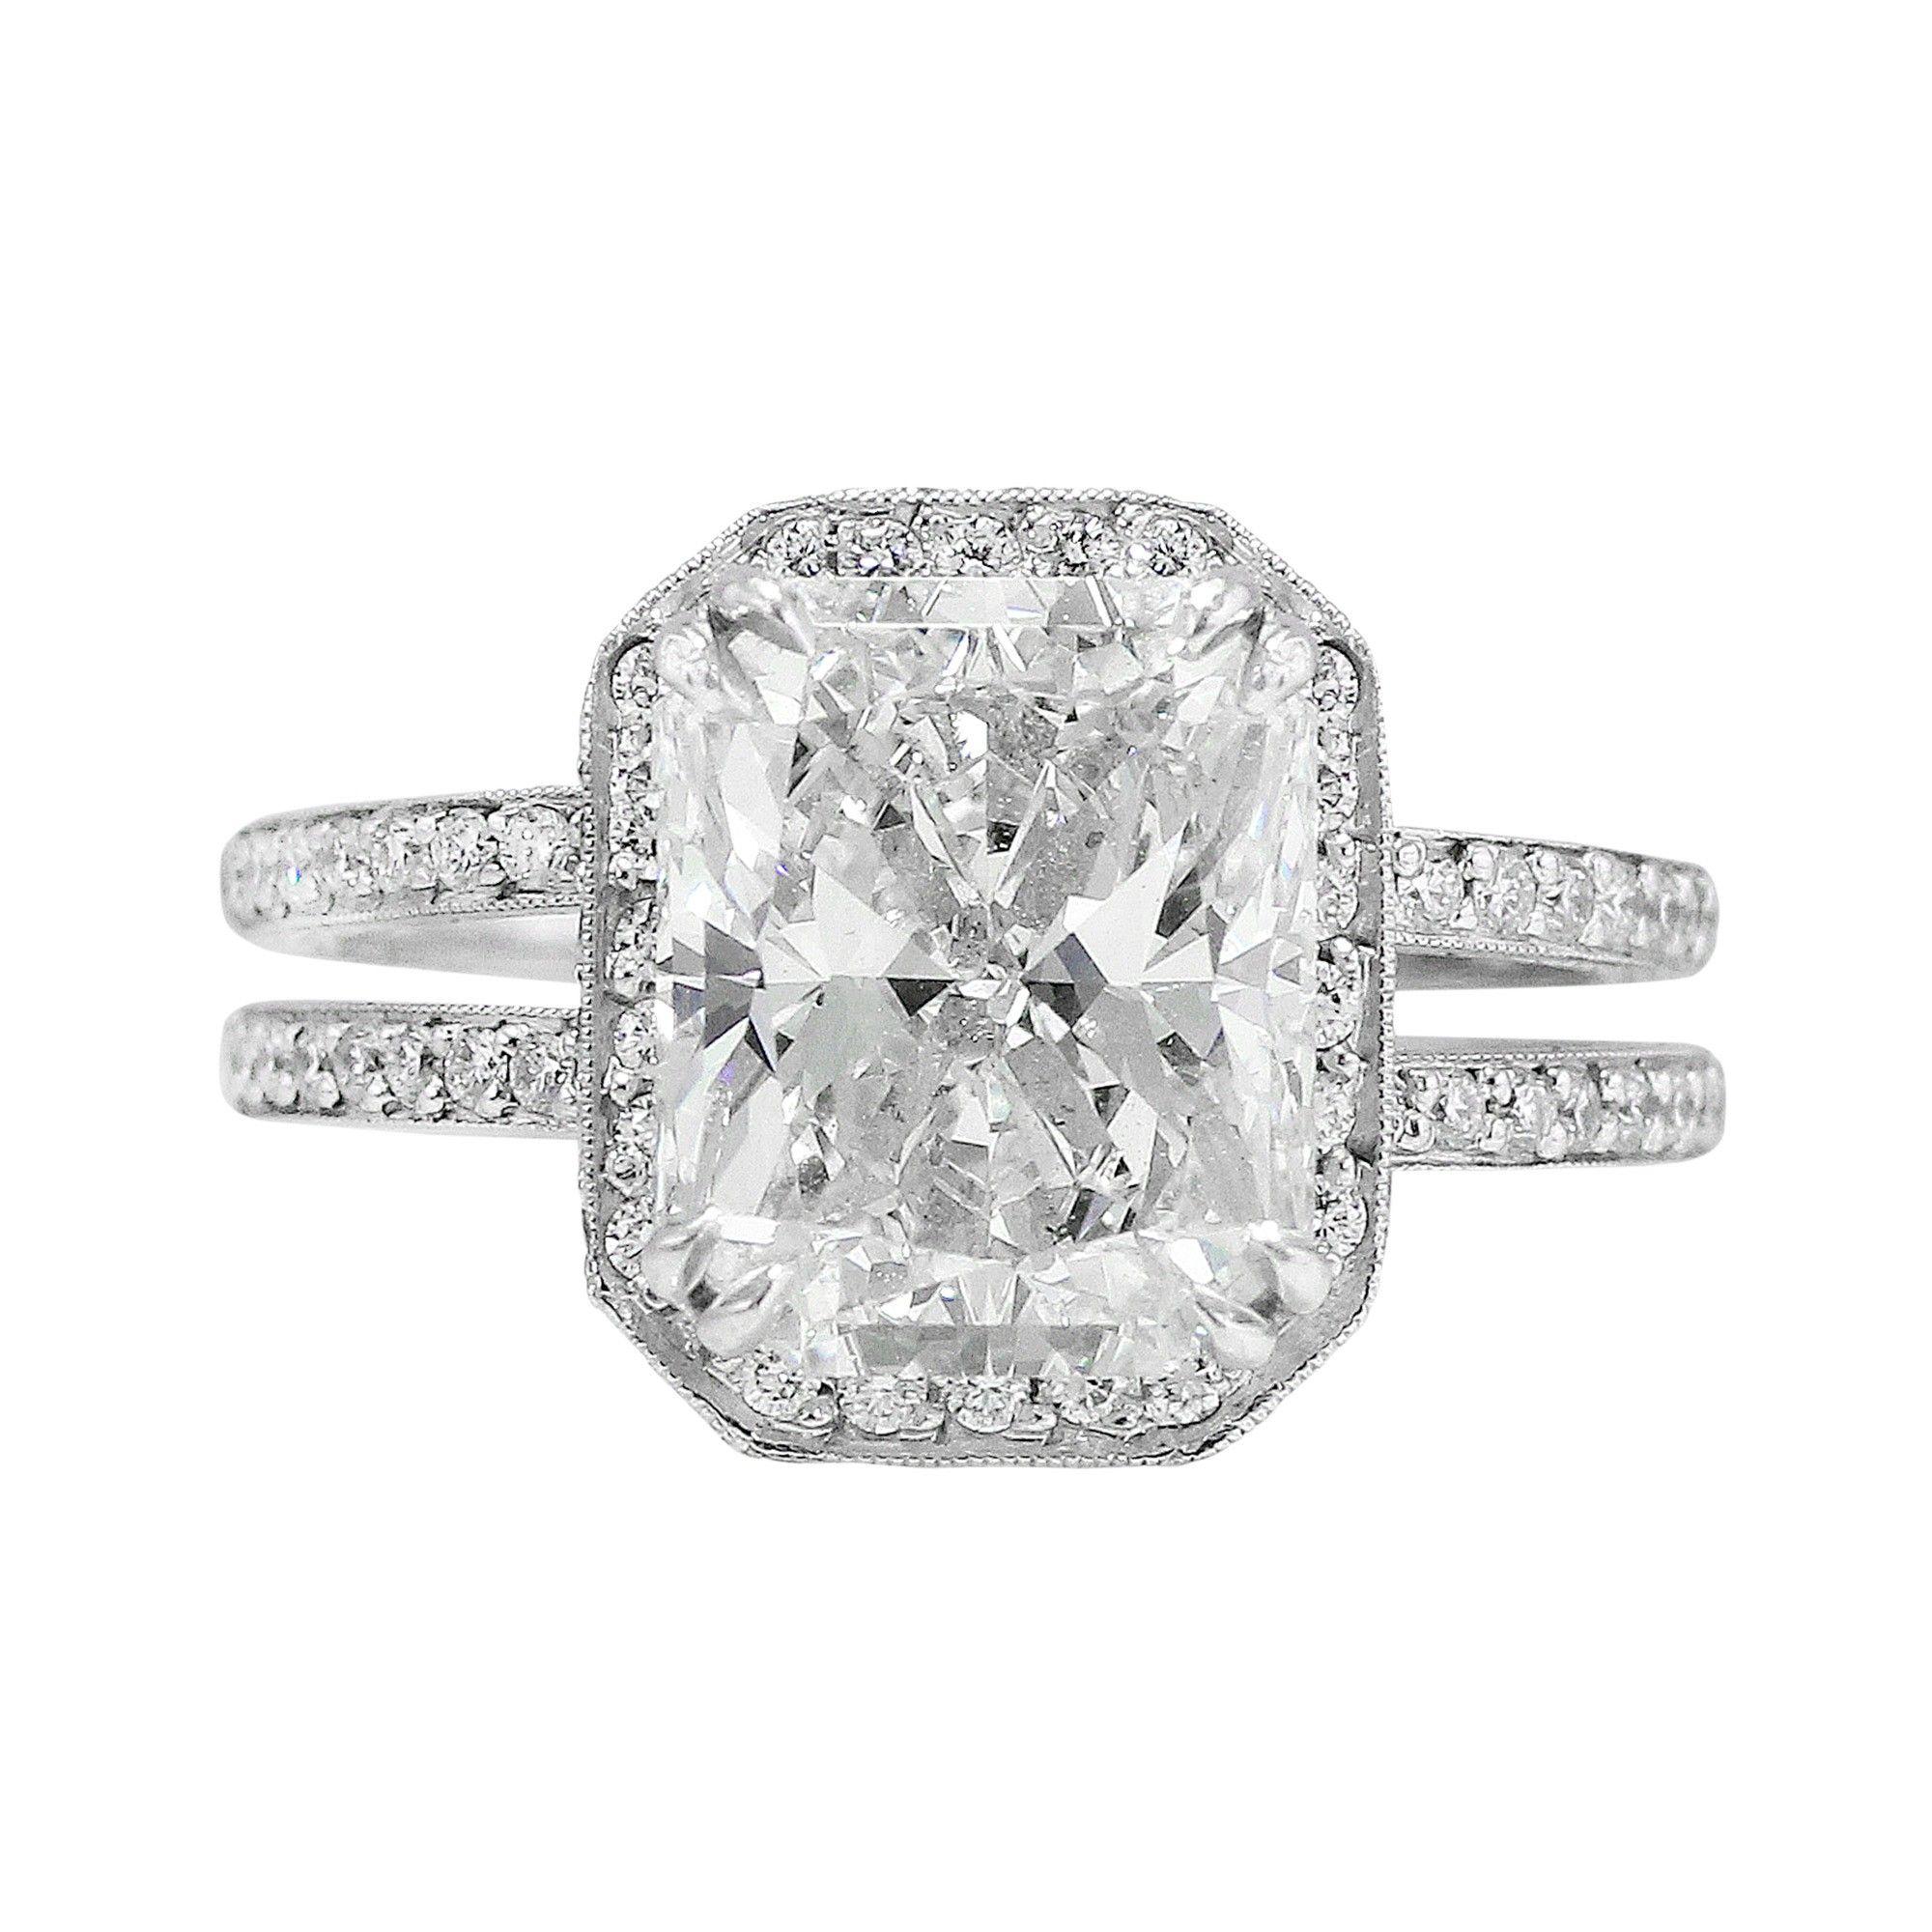 Ct internally flawless radiant cut diamond ring diamond rings